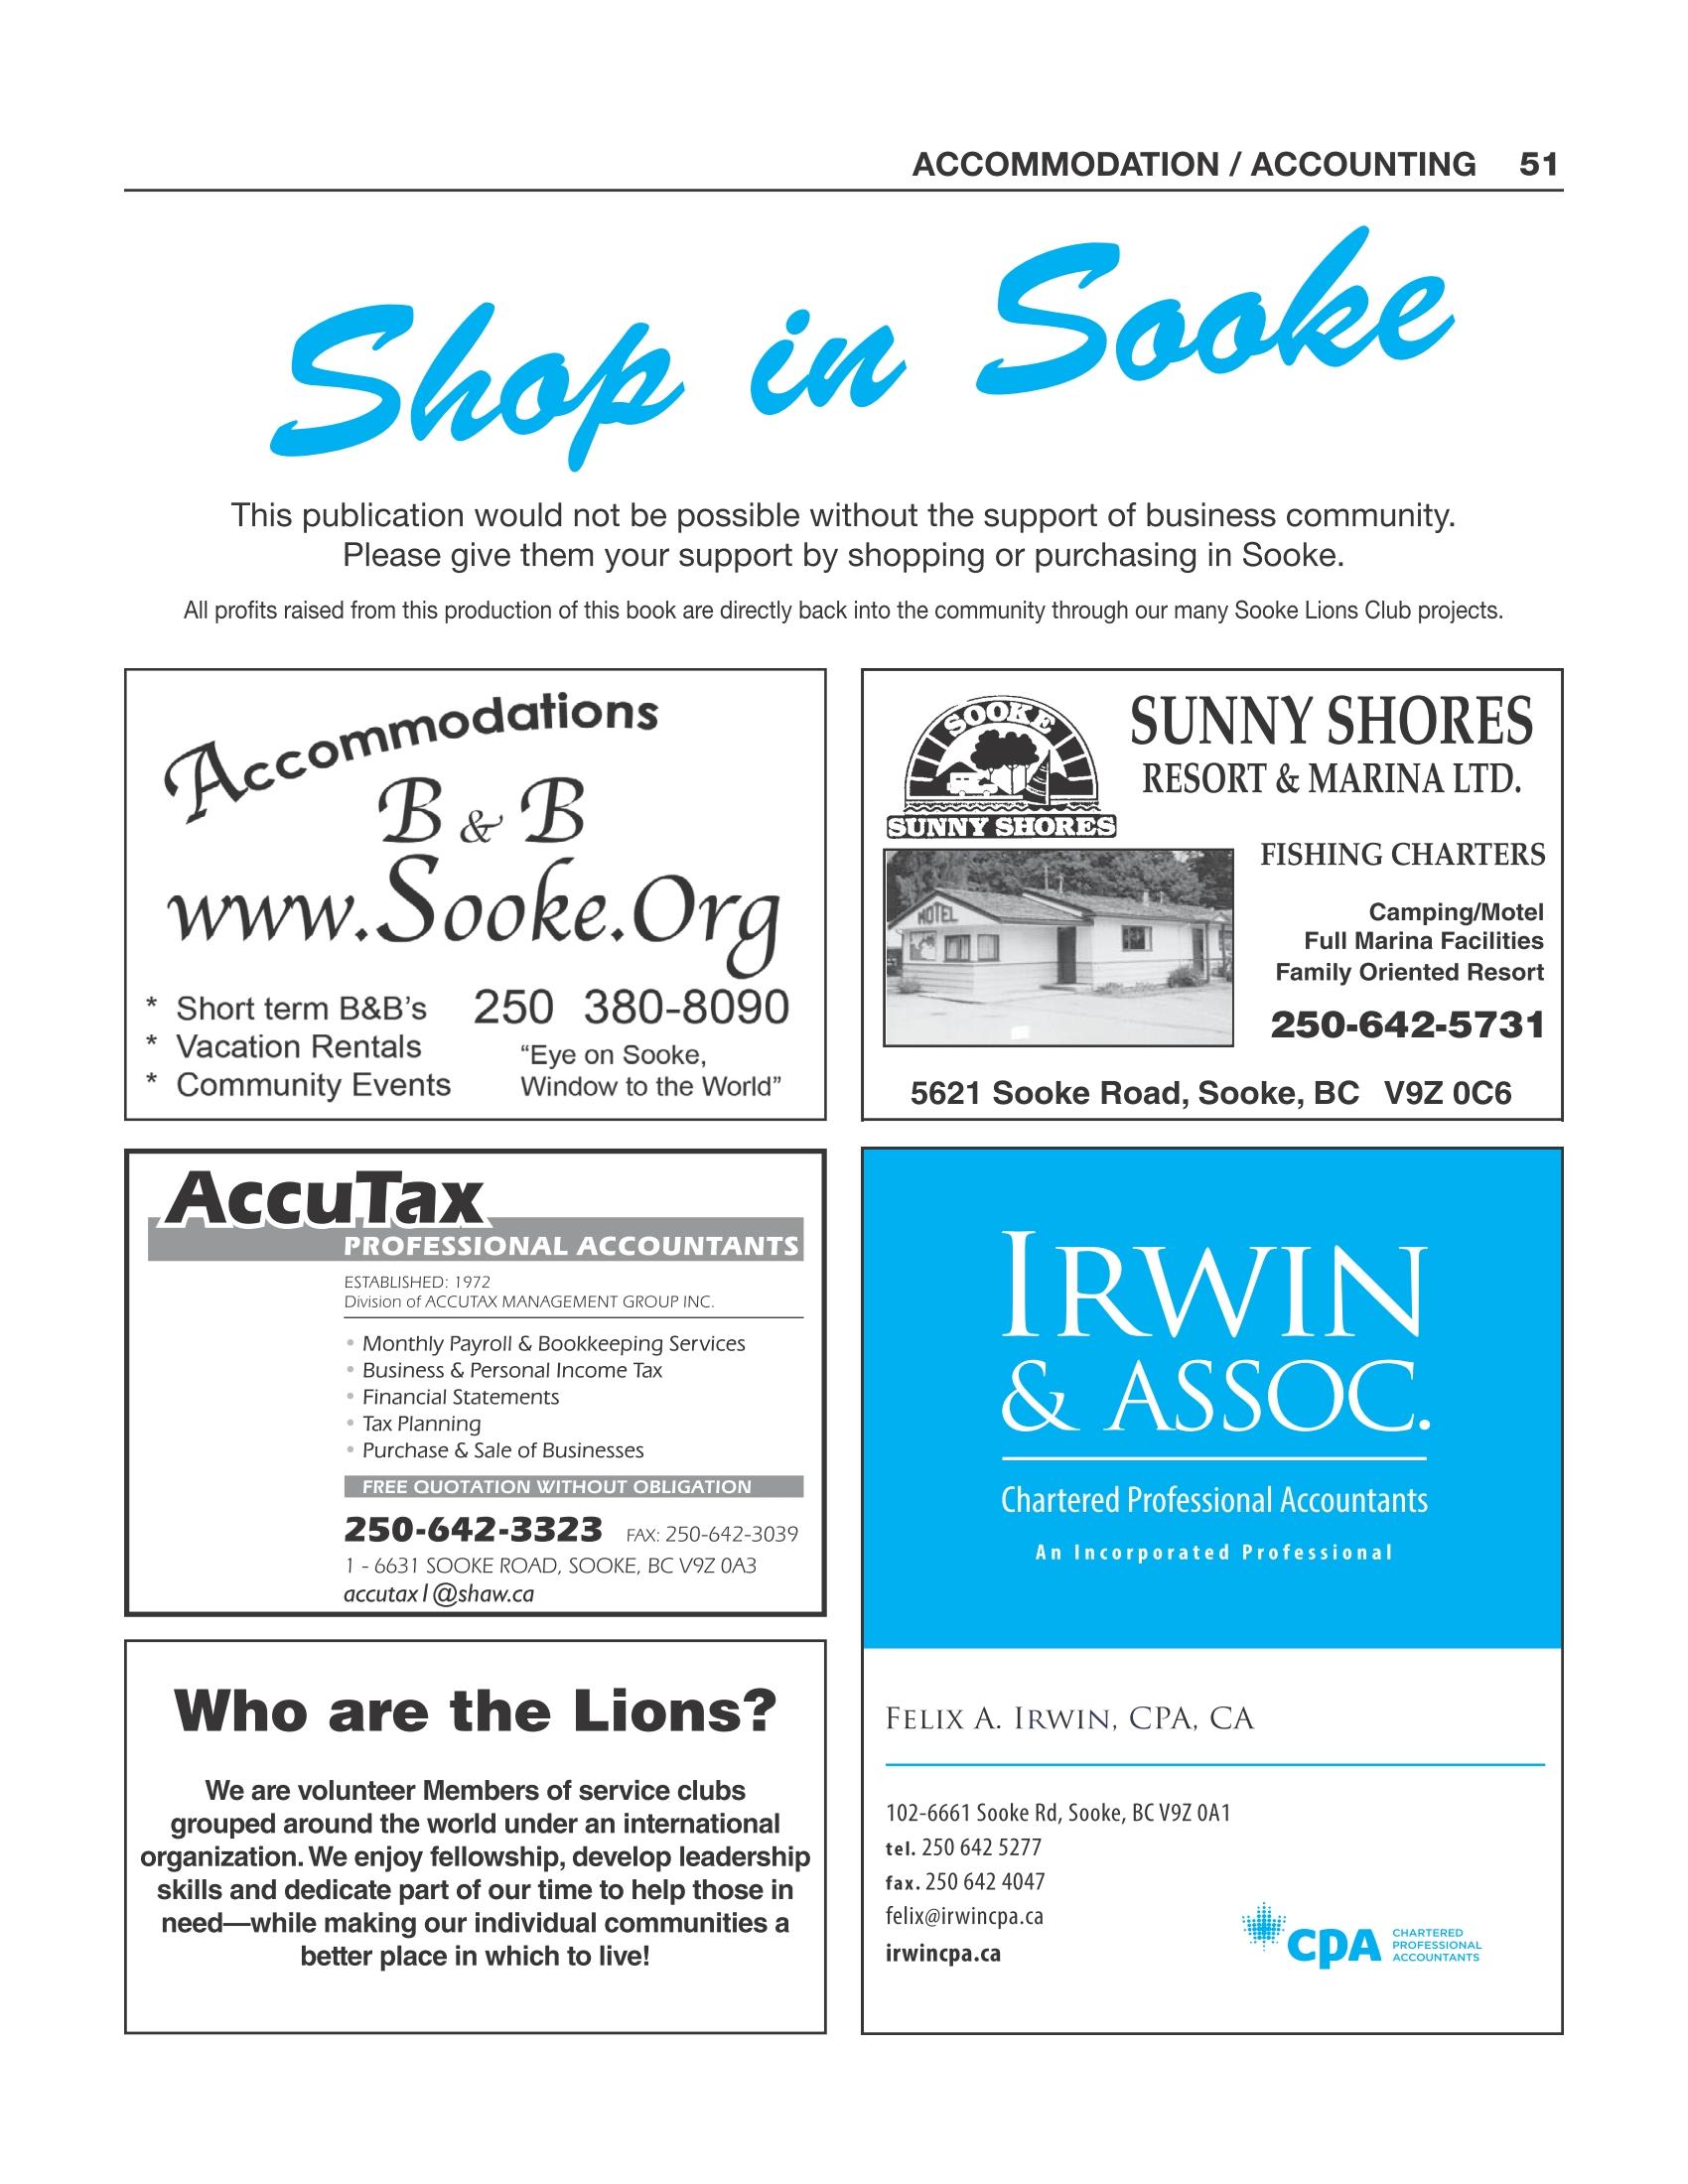 Sooke Accommodation / Accounting